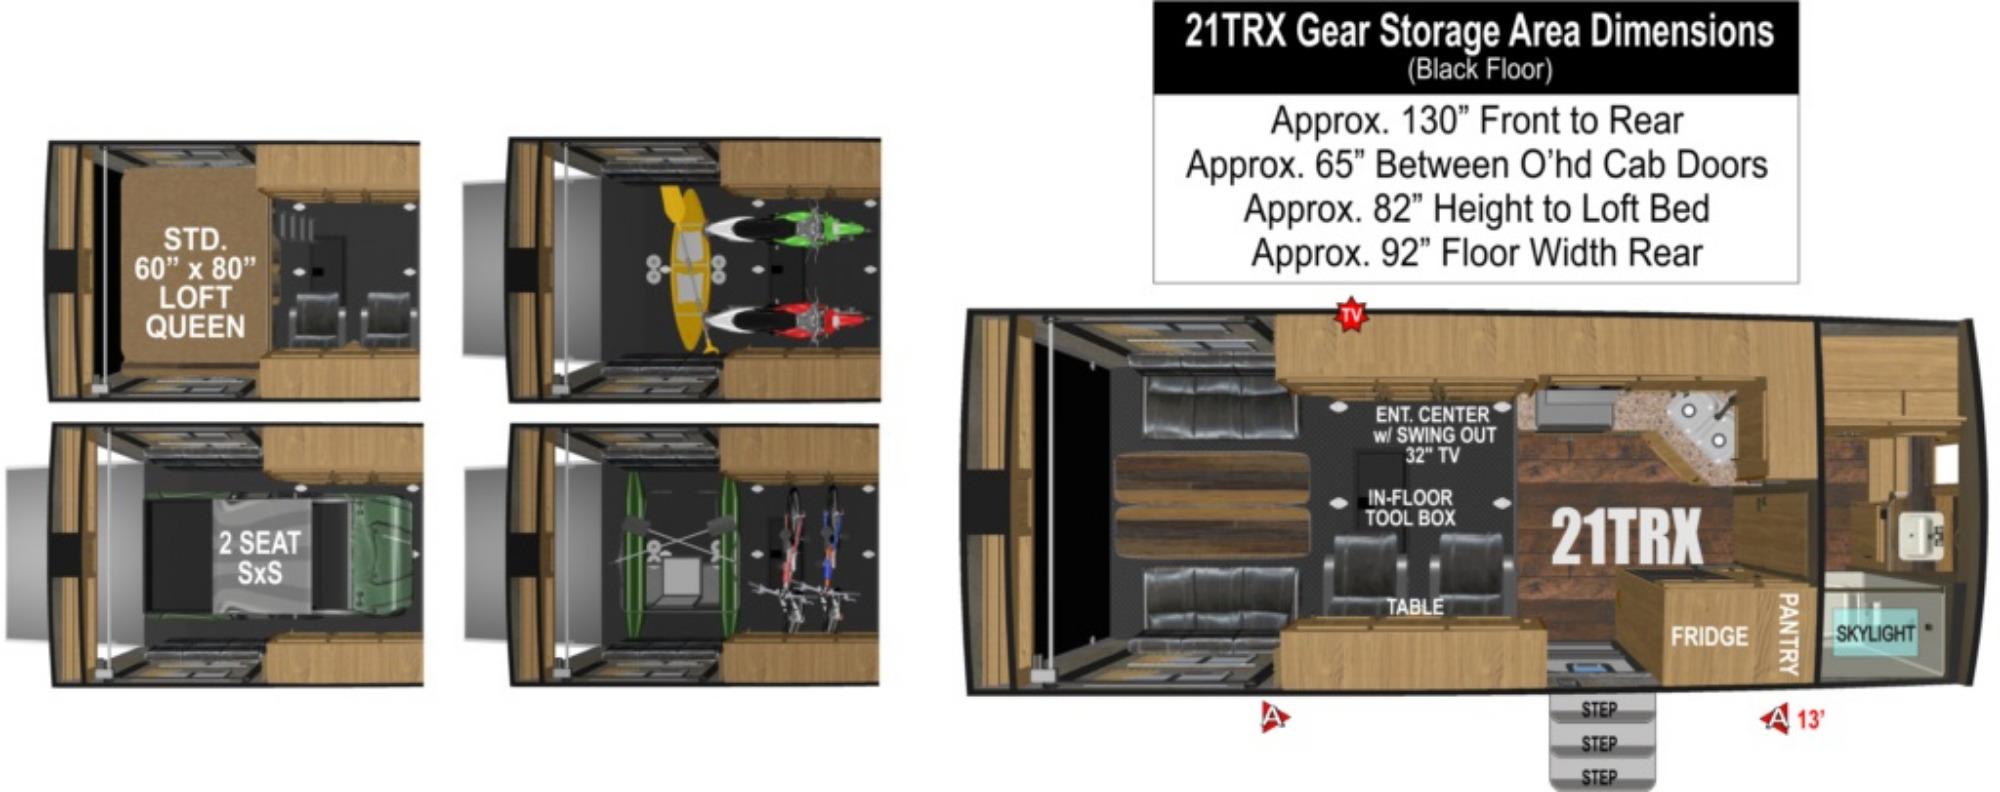 Garage : 2019-OUTDOORS RV-21TRX